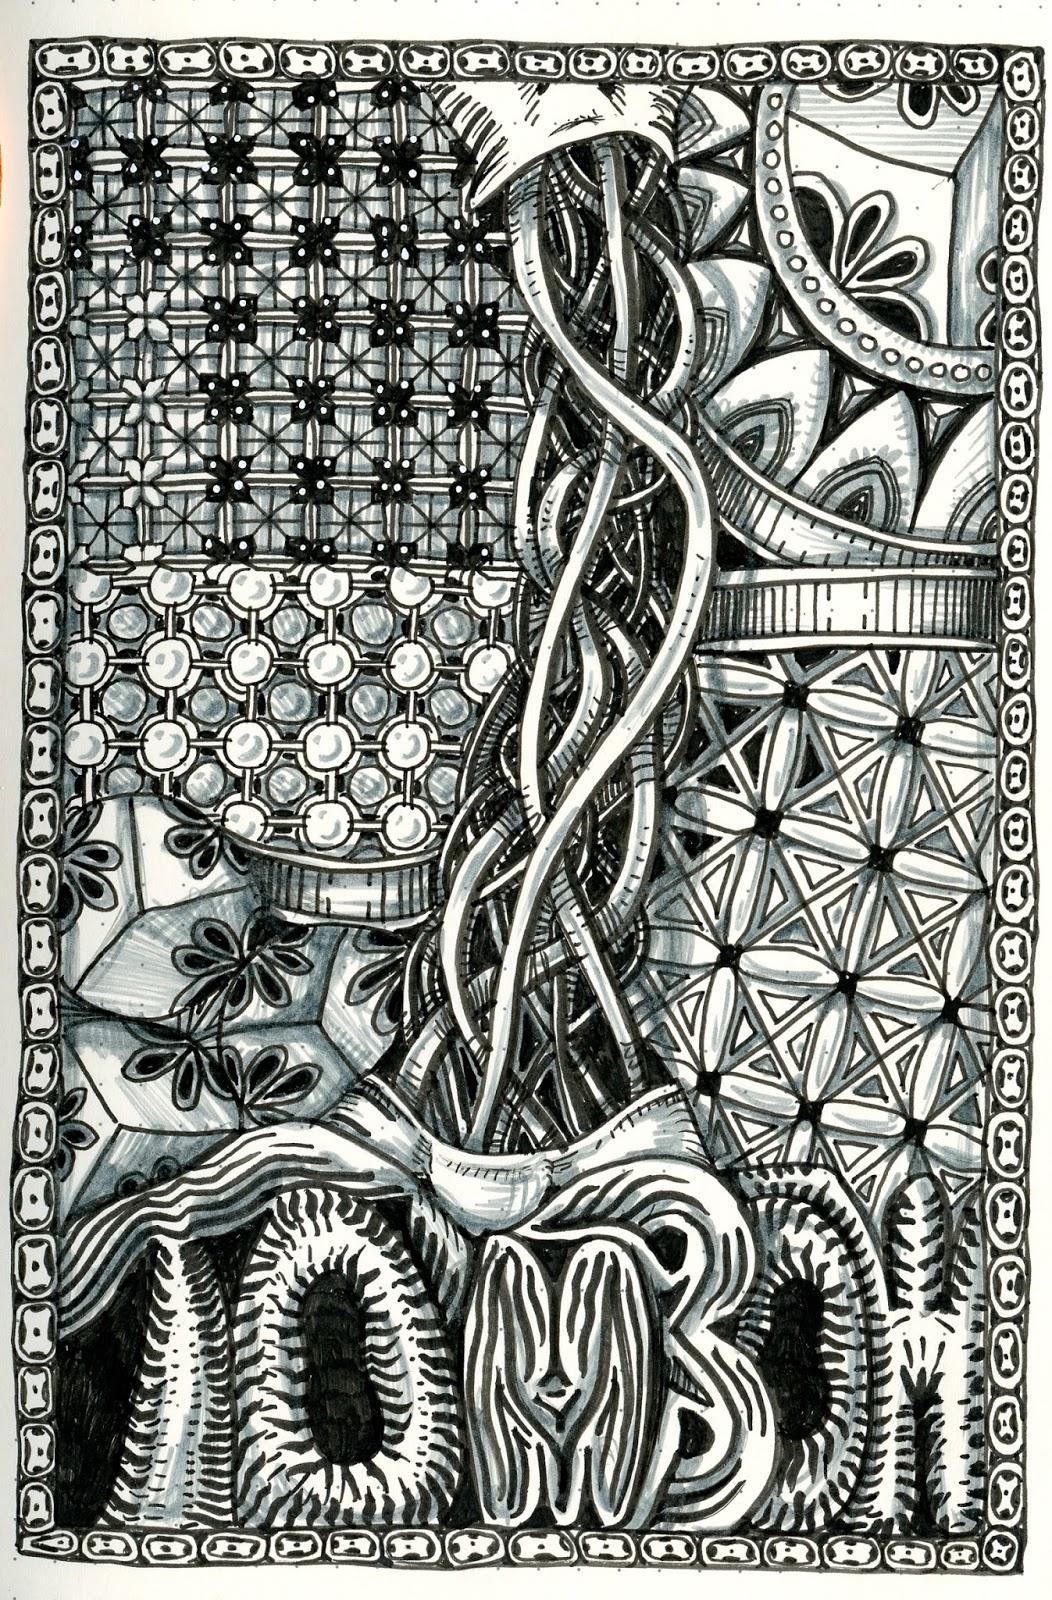 Tempat Jual Tombow Fudenosuke Twin Terbaru 2018 3second Tshirt 166031812kn Kuning S Review Brush Pen 3 Type Set Tombowusa Brushpen I Like Using These Pens